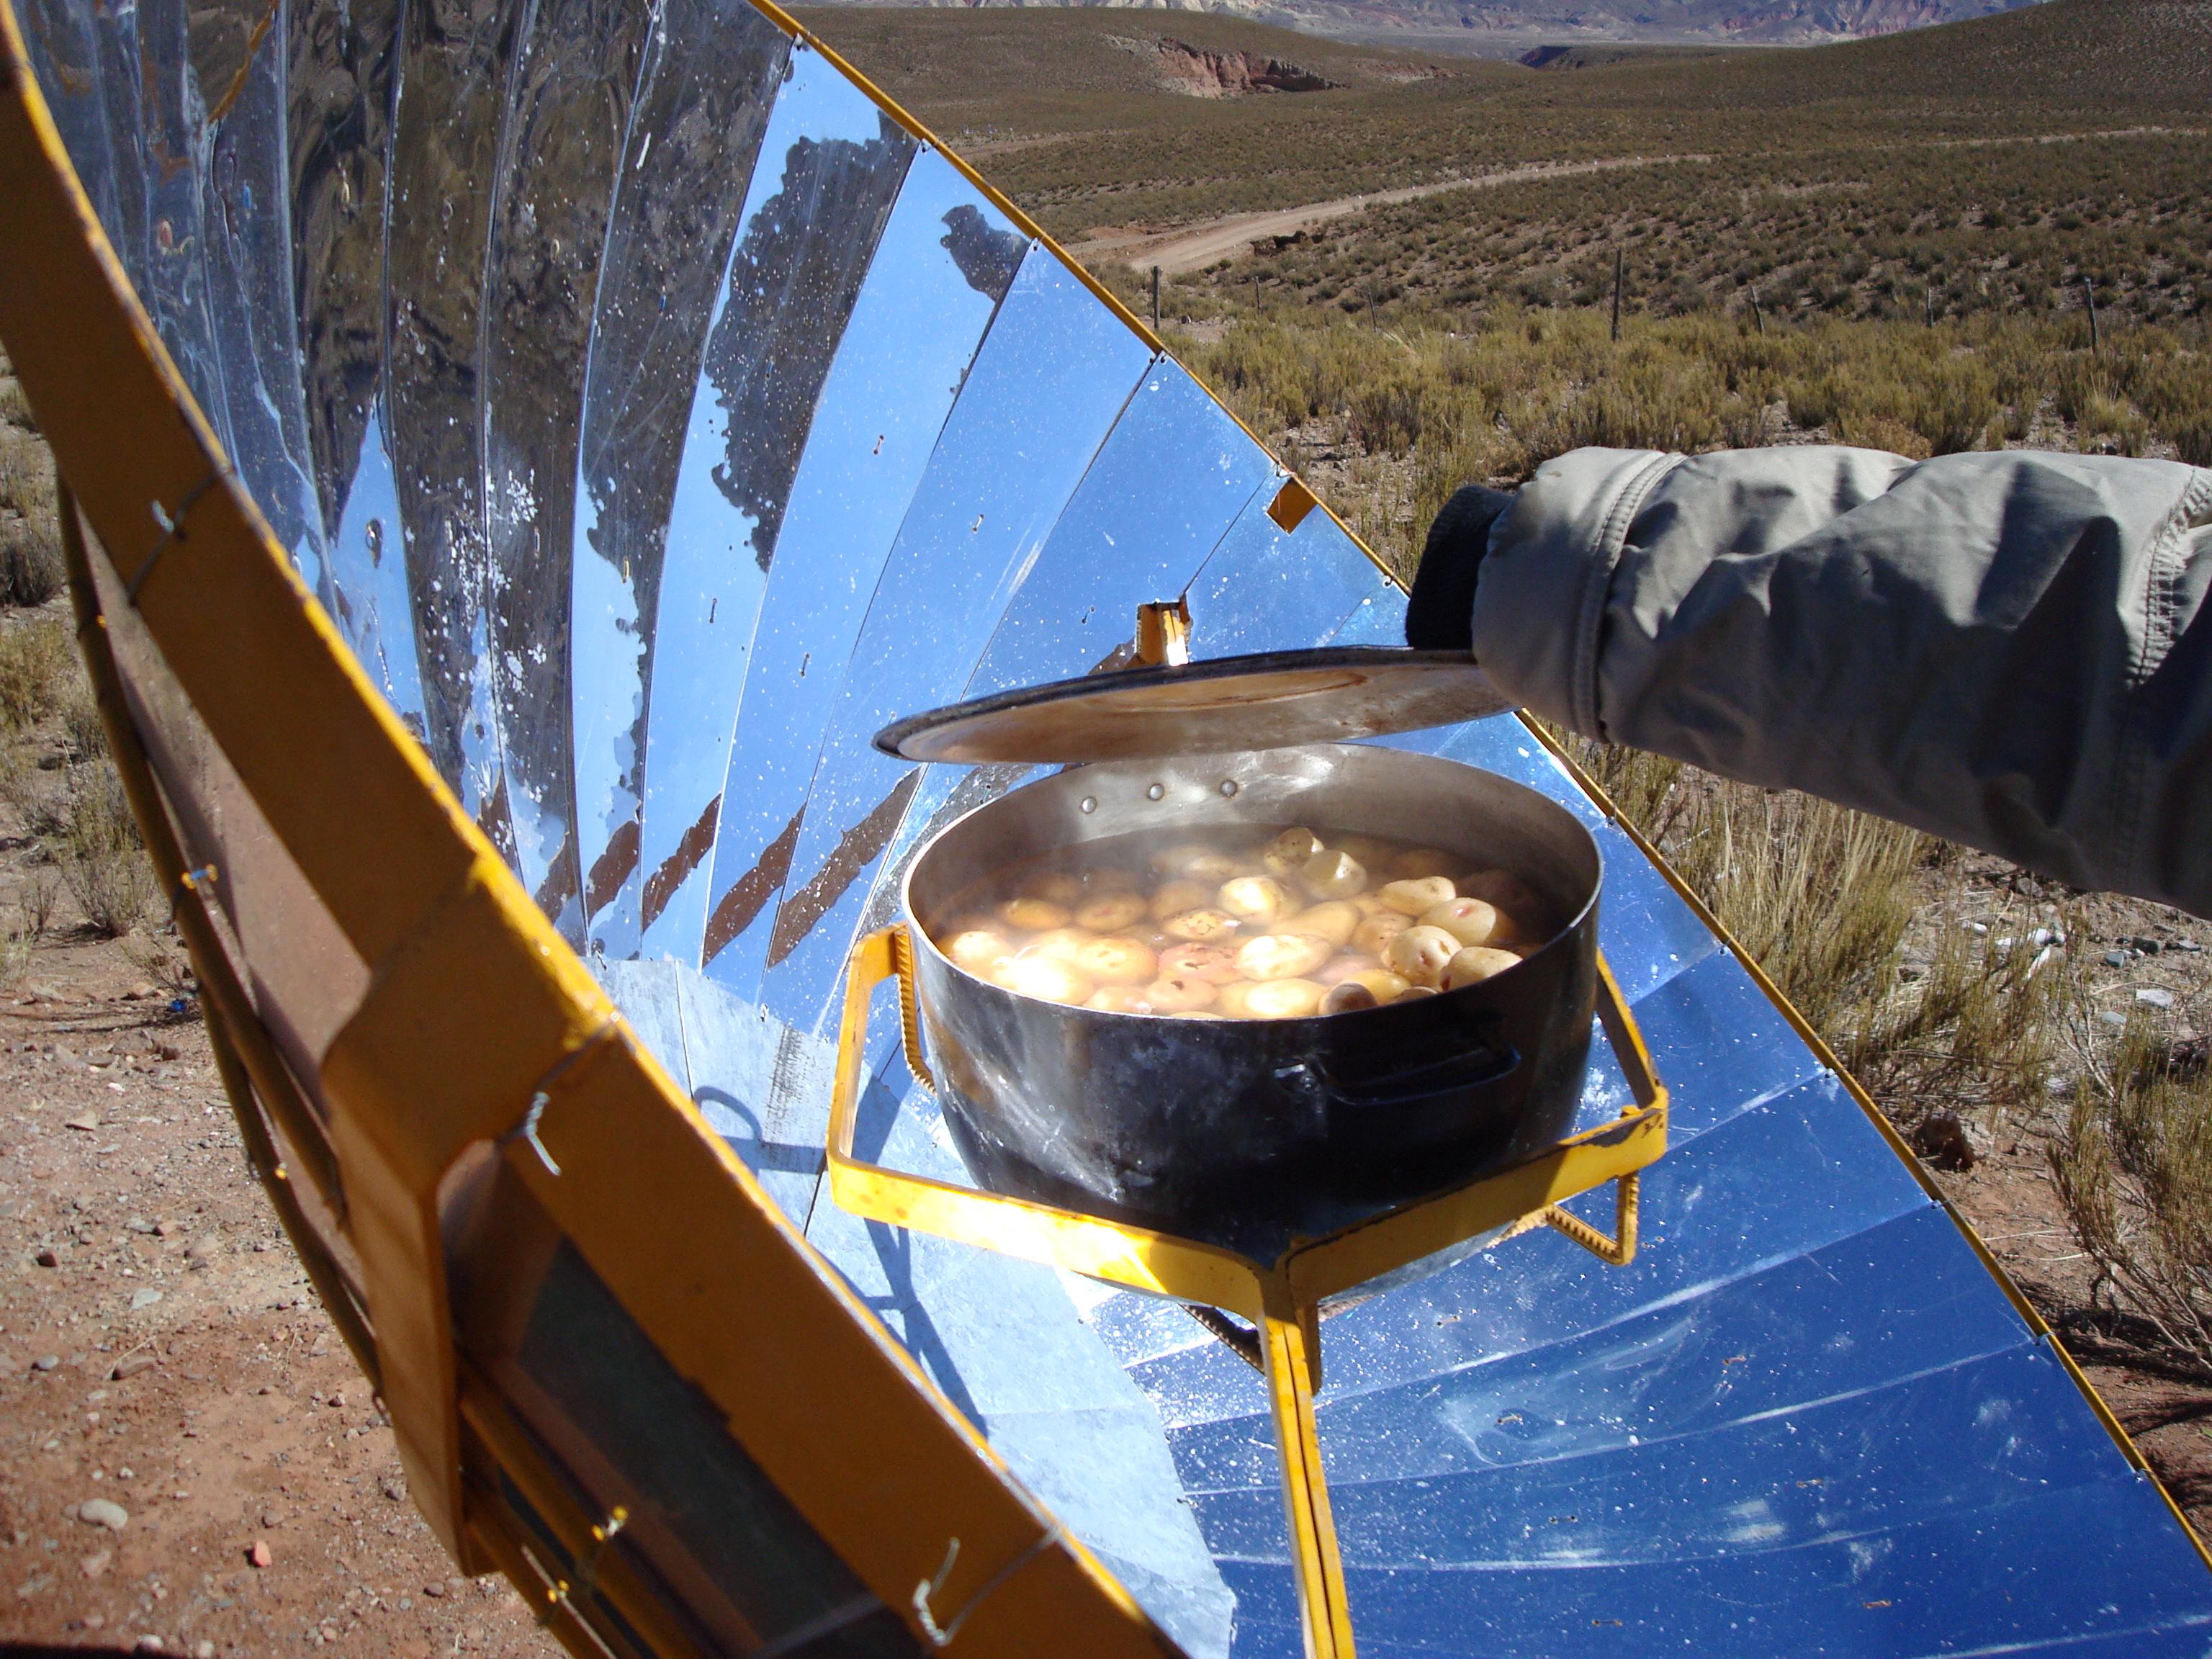 Cocinas Solares en Chile Chile Cocinas Solares Para